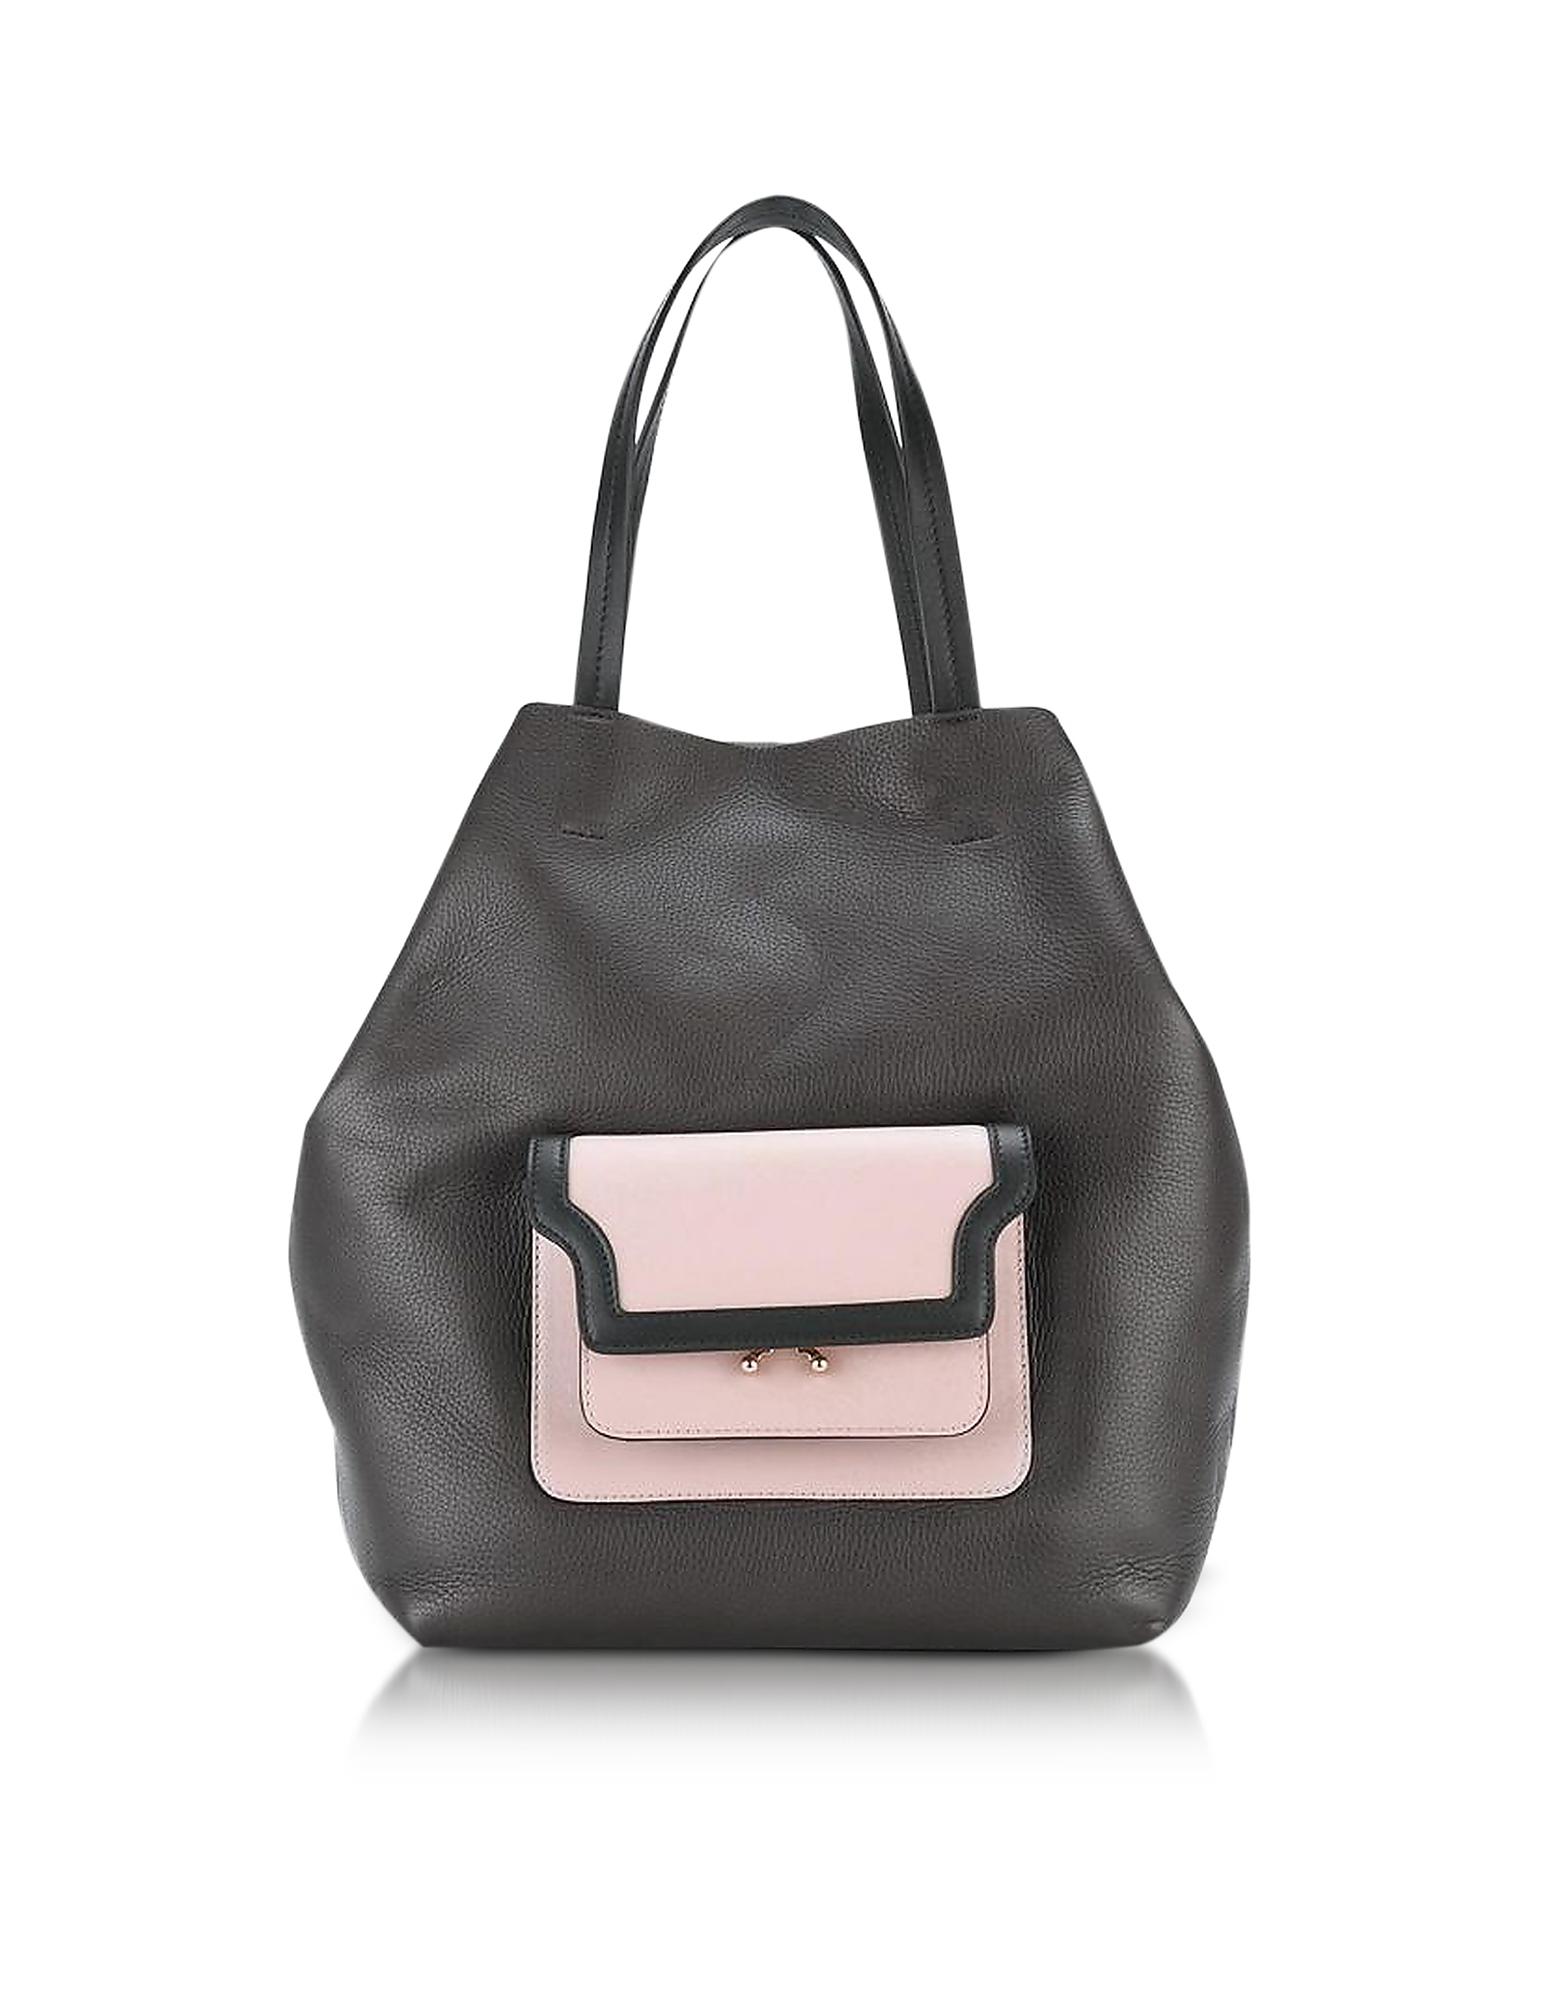 Marni Handbags, Dark Chocolate, Cement and Quartz Leather Hexagonal Trunk Bag